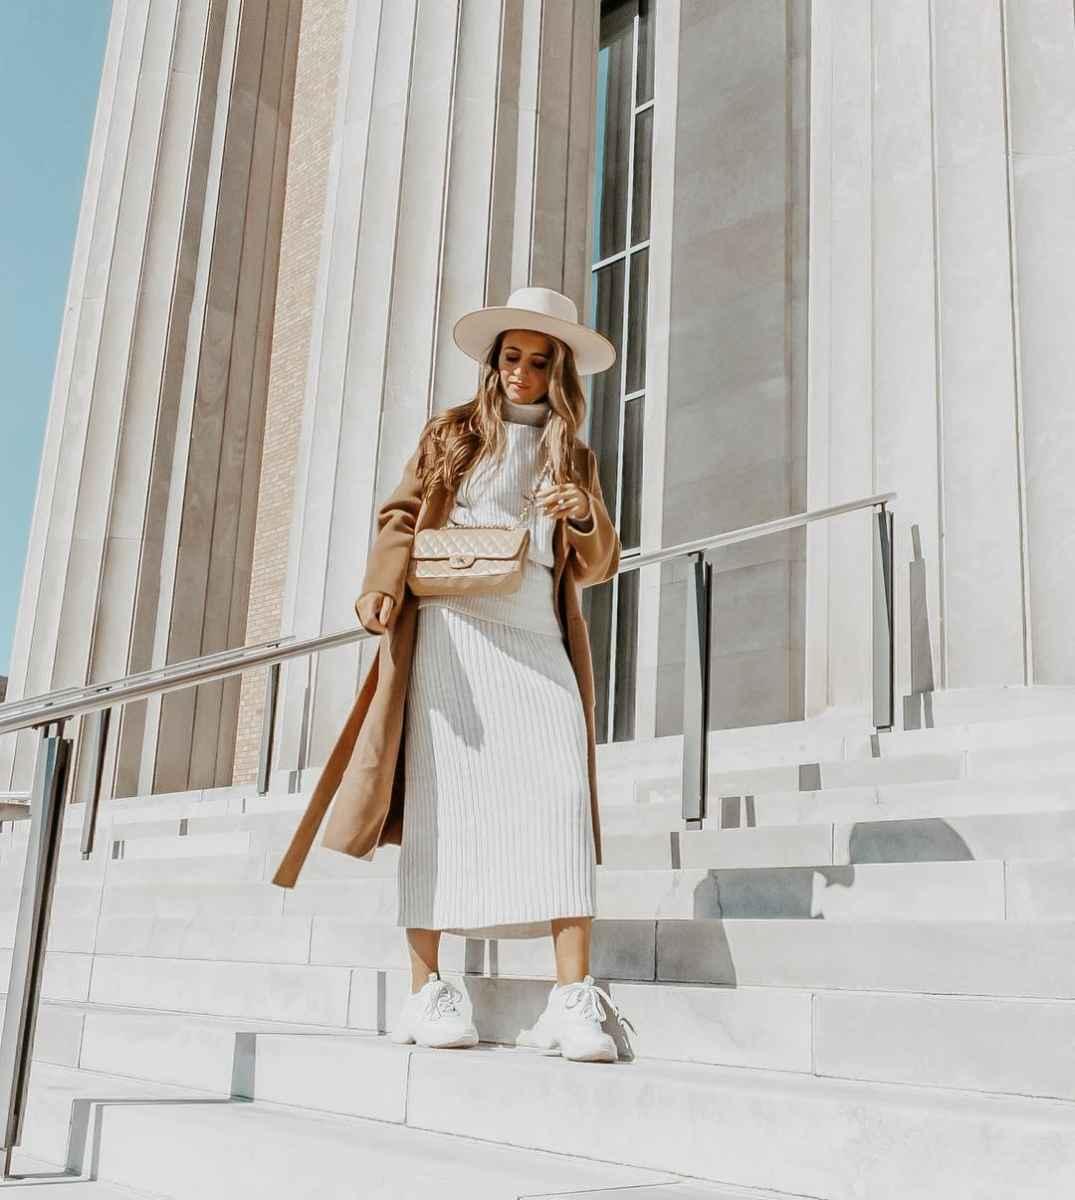 Мода для невысоких осень-зима 2019-2020 фото_96